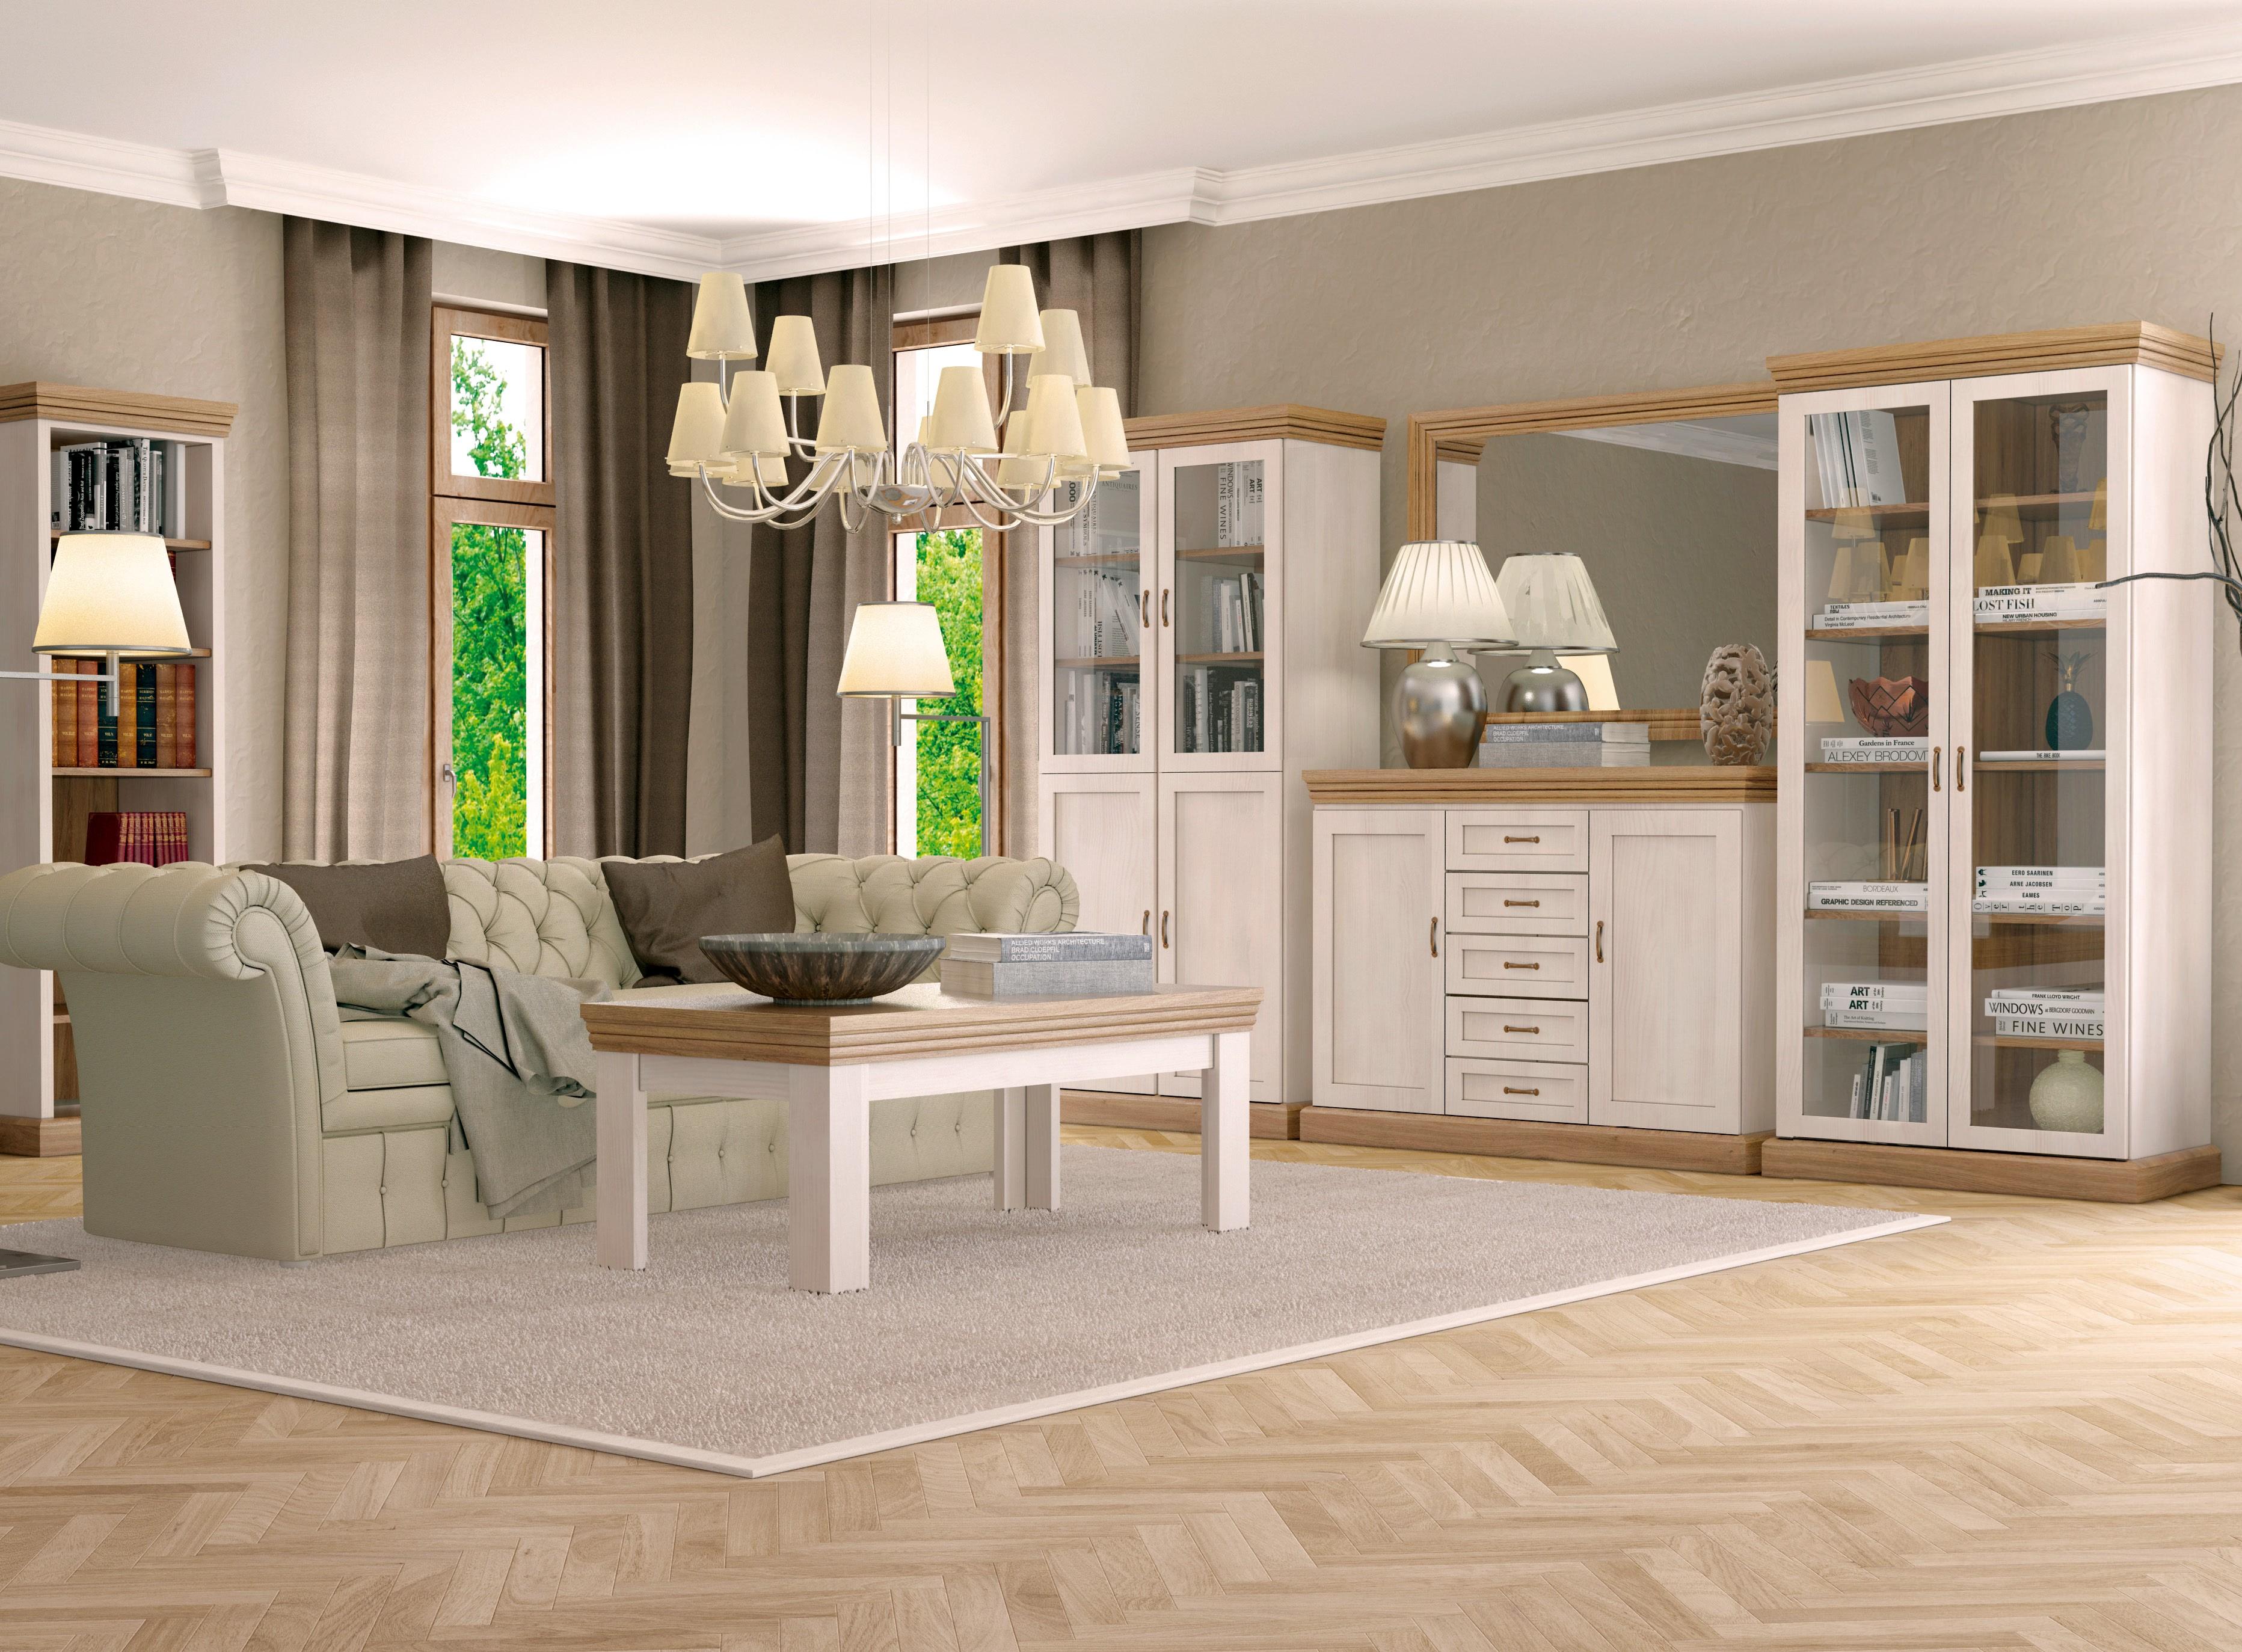 nordische m bel badezimmer schlafzimmer sessel m bel design ideen. Black Bedroom Furniture Sets. Home Design Ideas